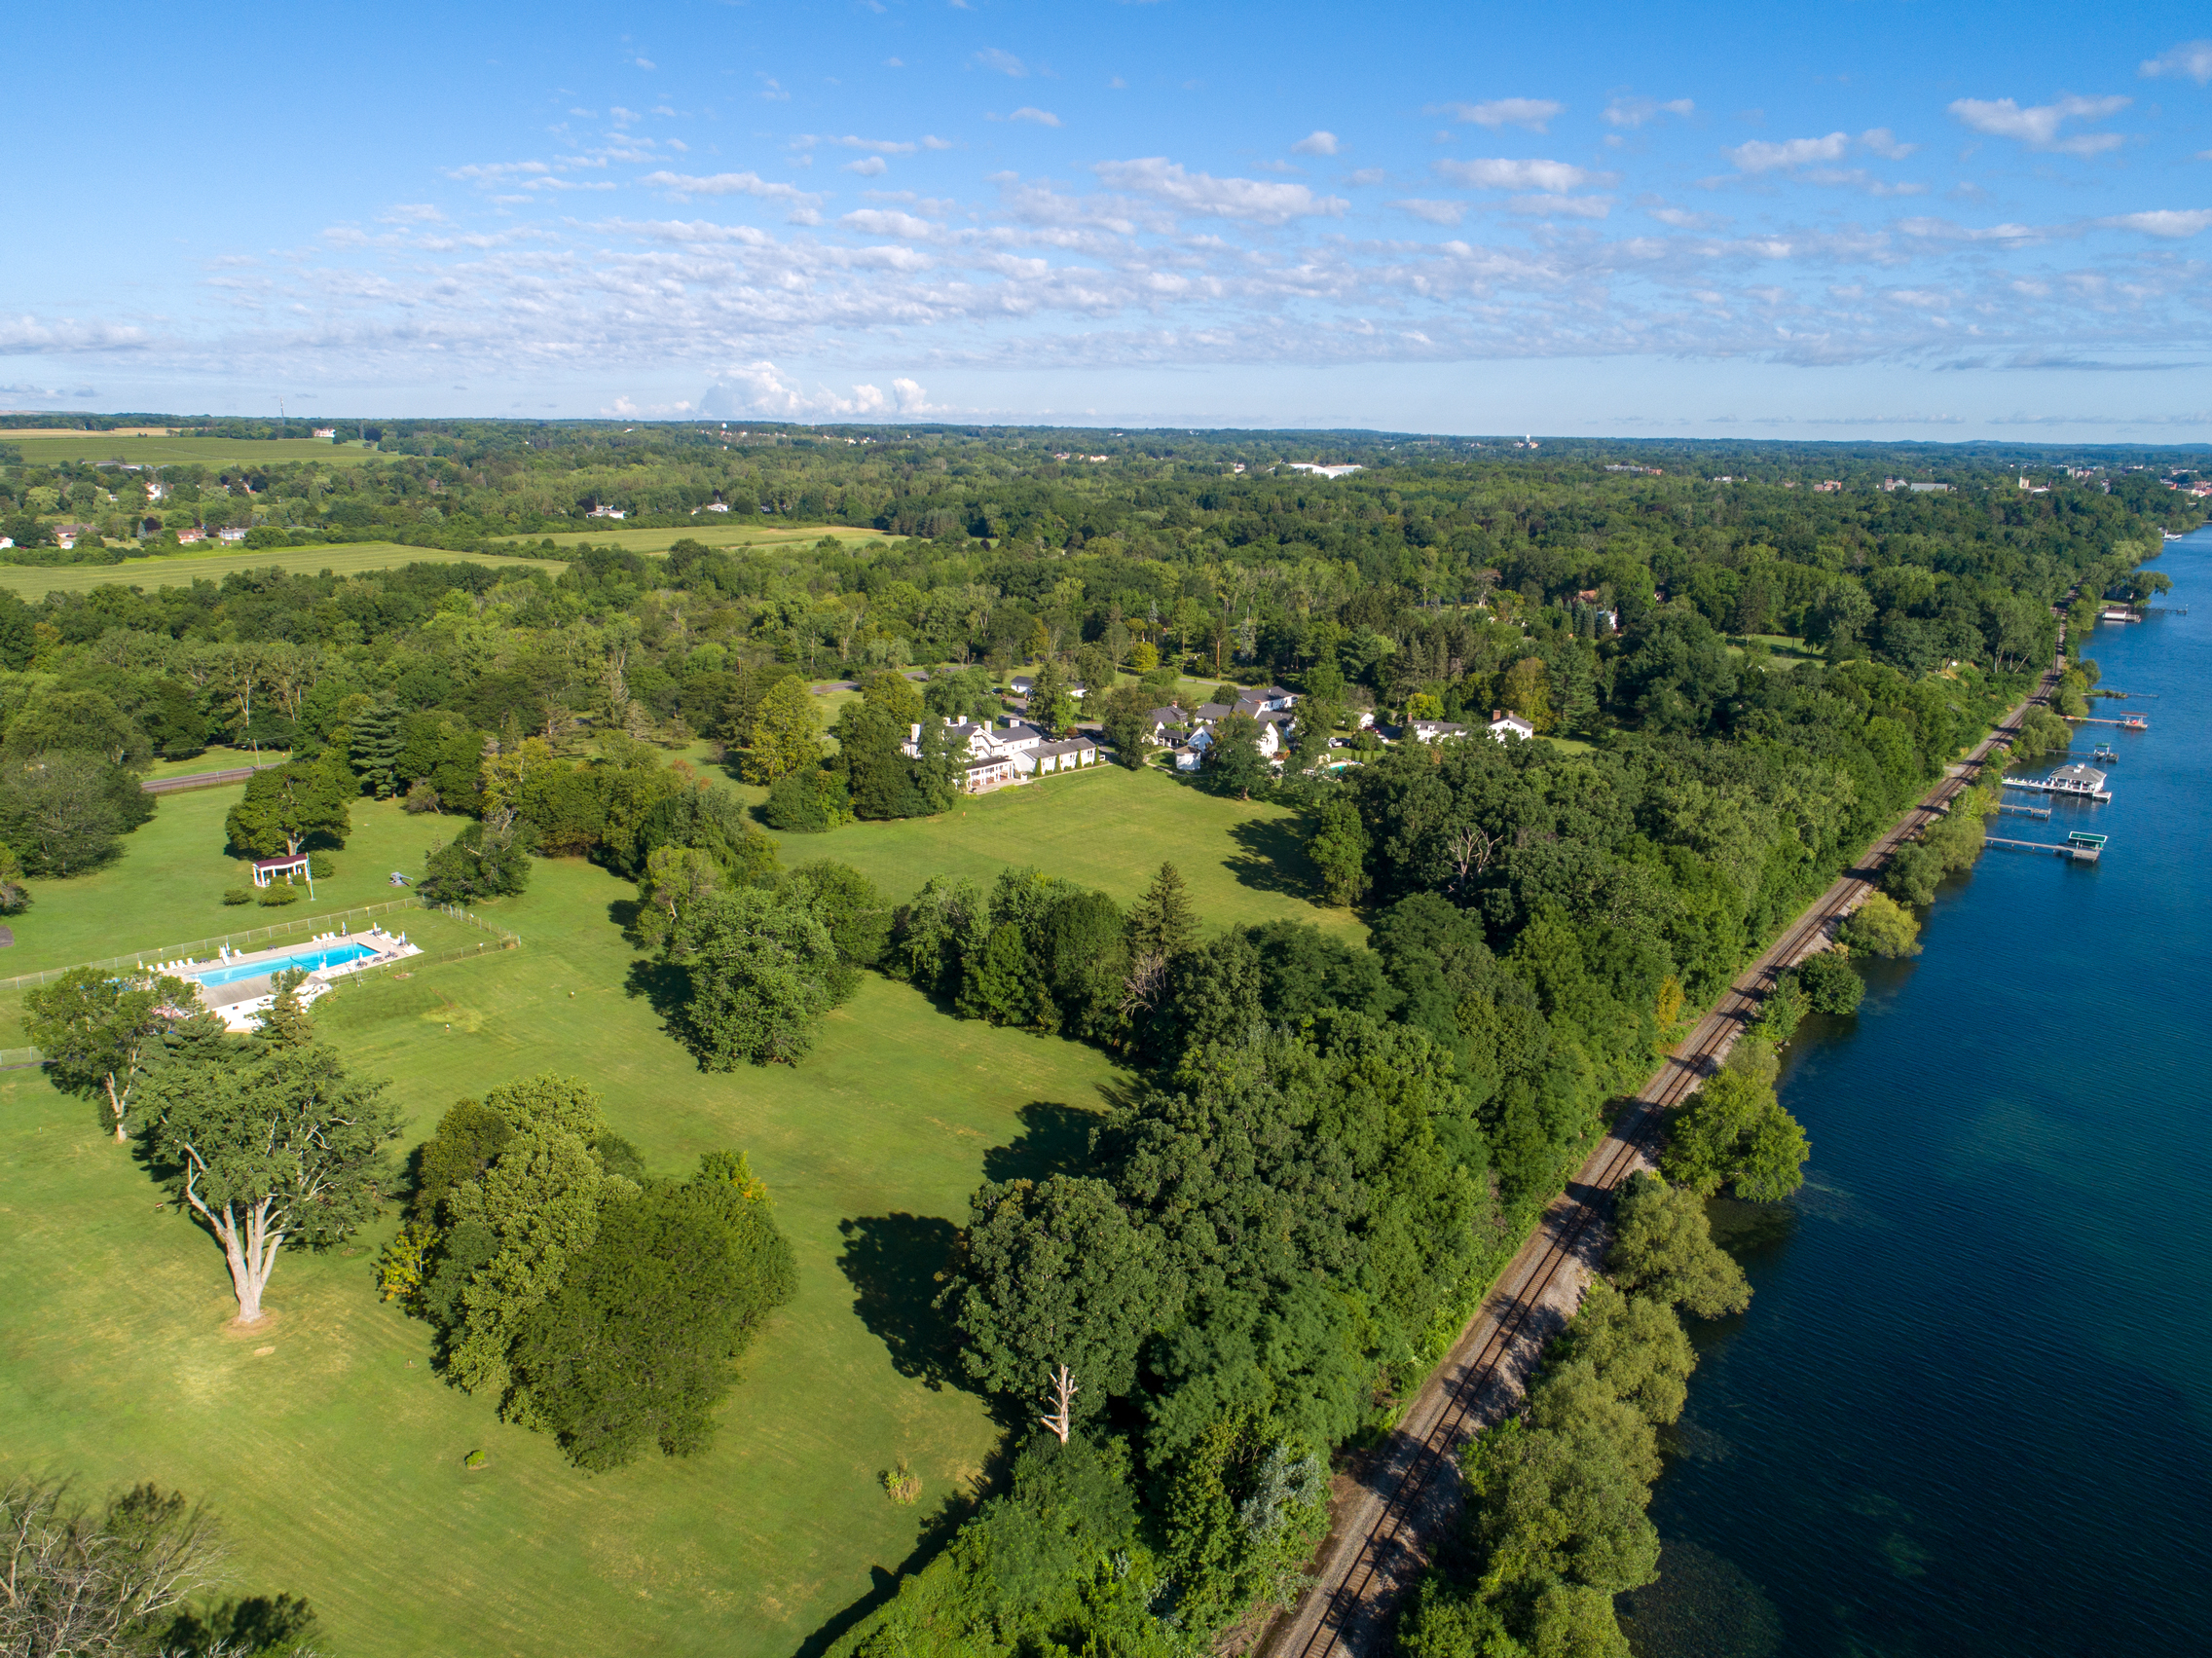 12 Seneca Lake Auction, American Legion, 1115 Lochland Rd, Geneva, NY 14456, Seneca Lake, Finger Lakes Property Listed For Sale by Michael DeRosa, Real Estate Broker, Michael DeRosa Exchange.JPG